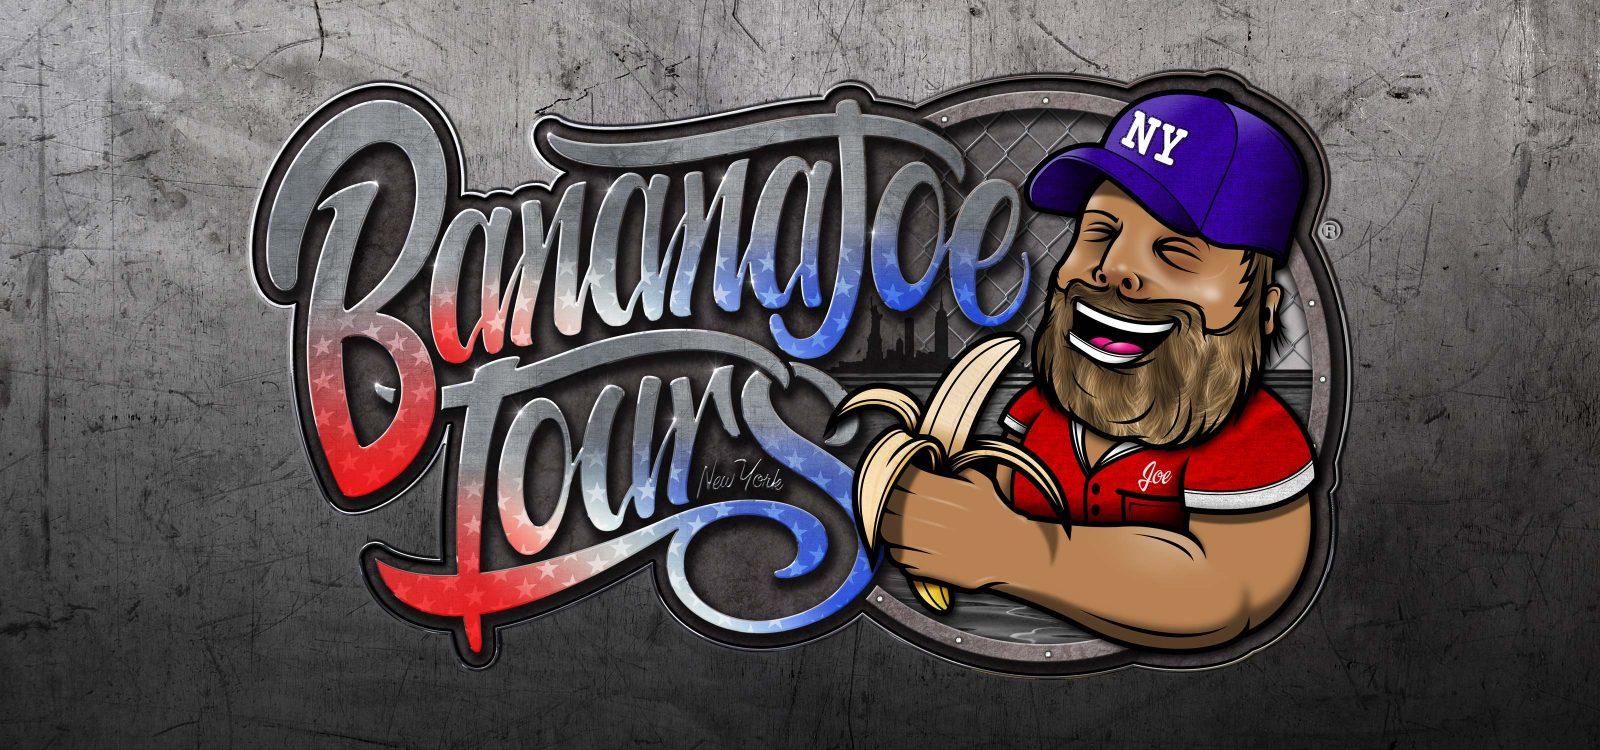 banana-joe-tours-new-york-holding-image